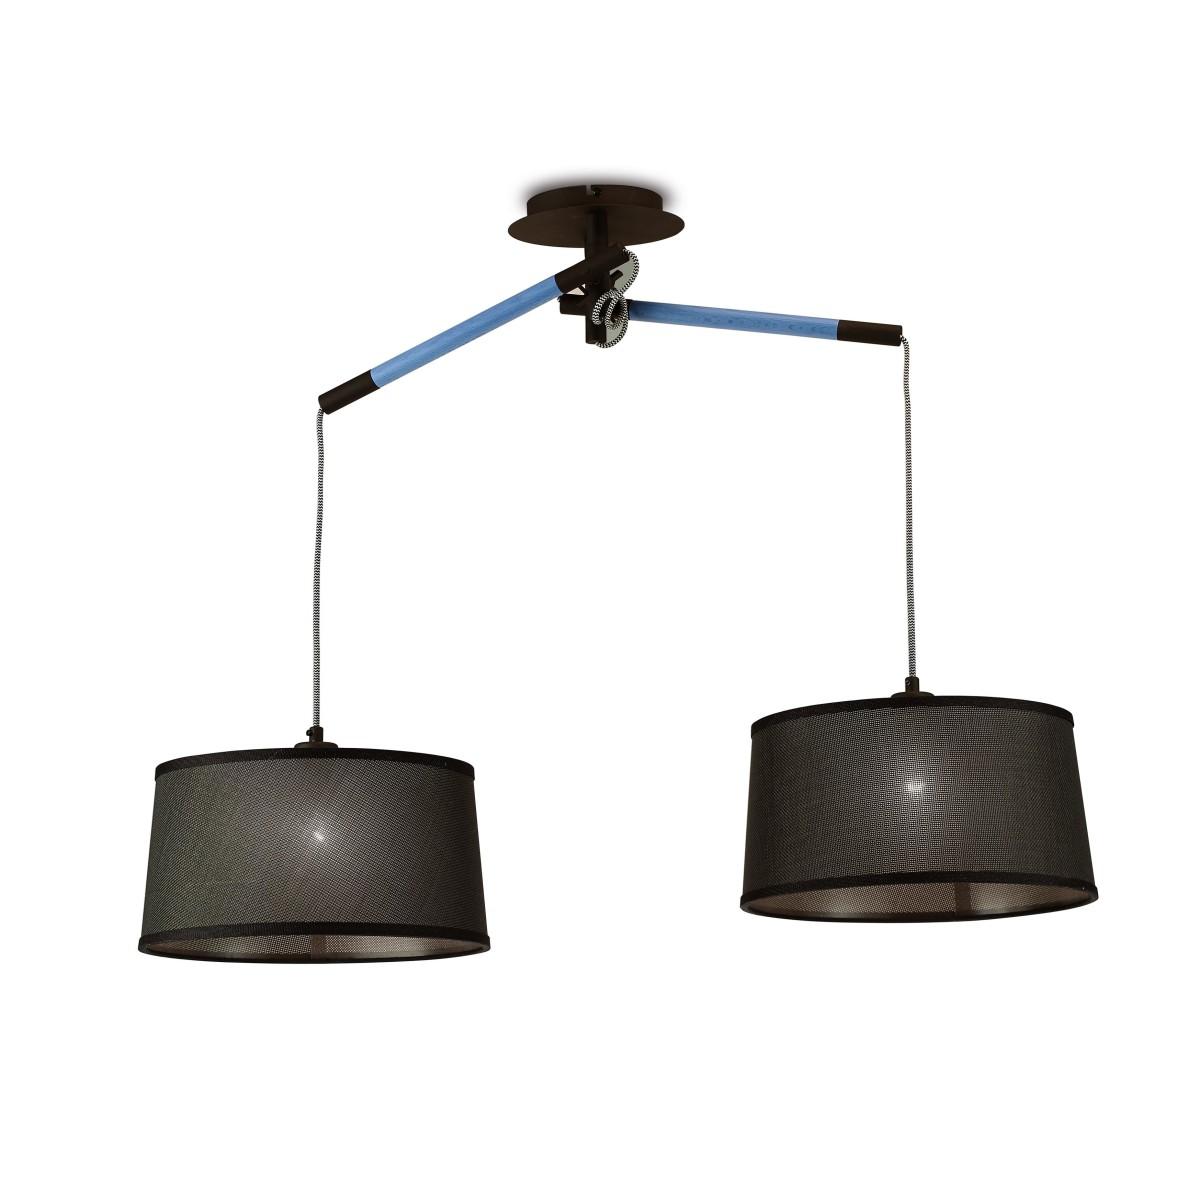 Люстра Mantra Nordica 4931 2 ламп 9 м²